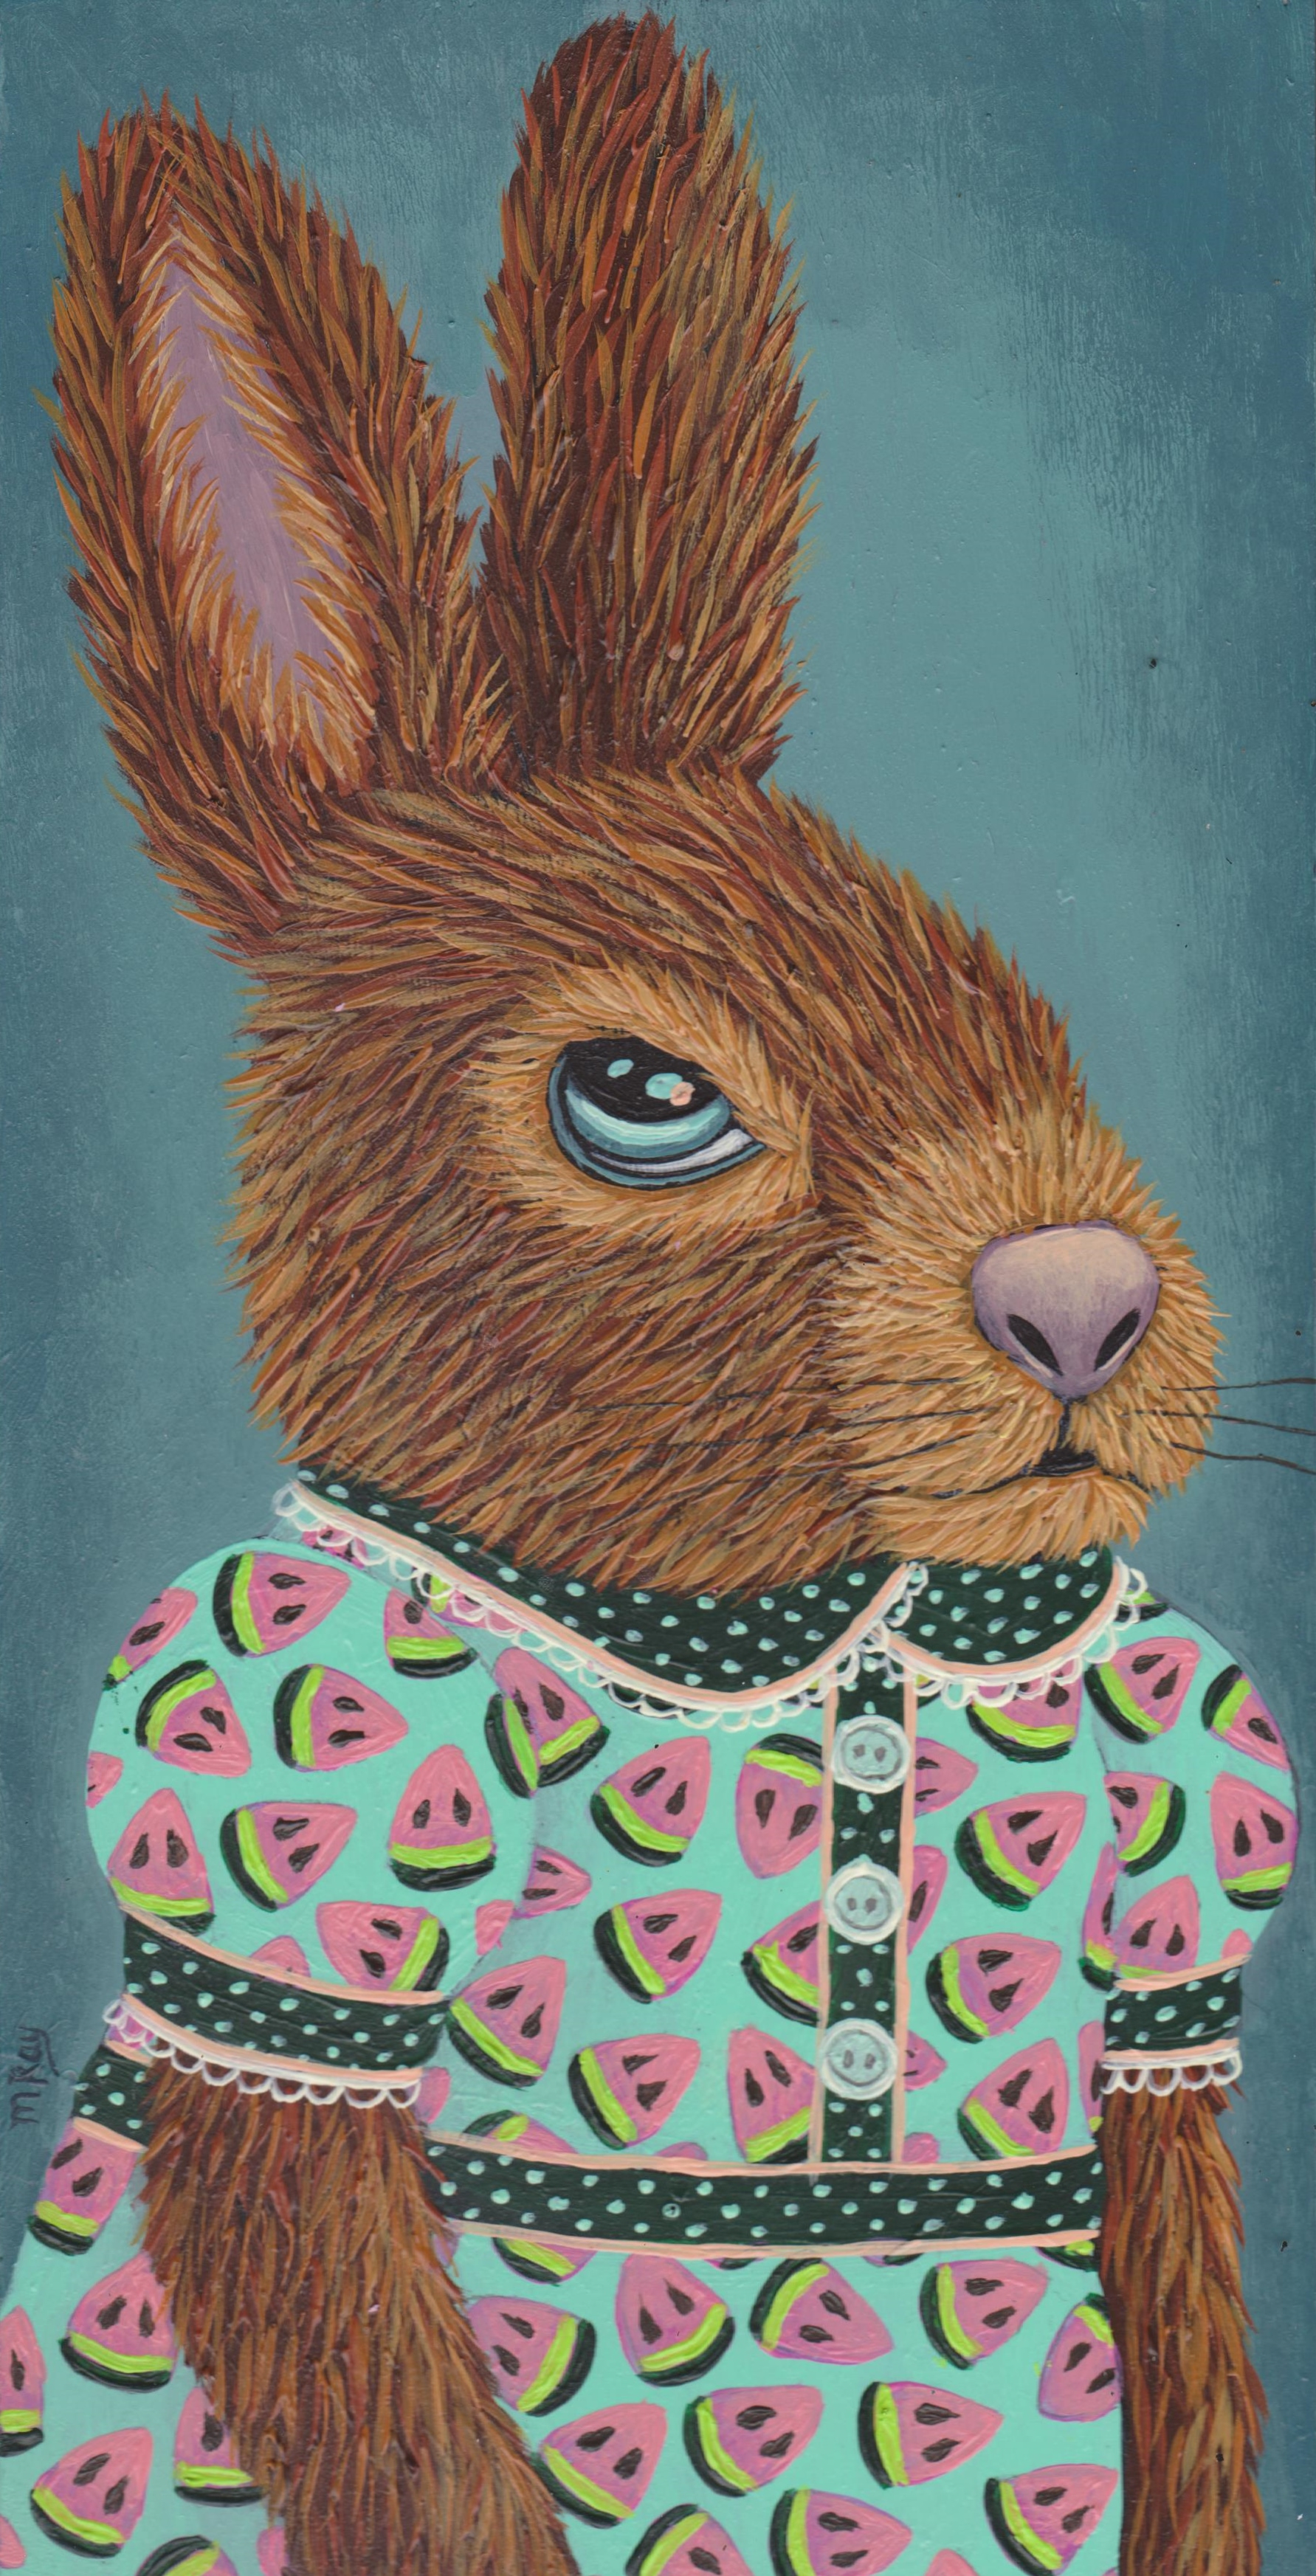 Bunny Dress #3